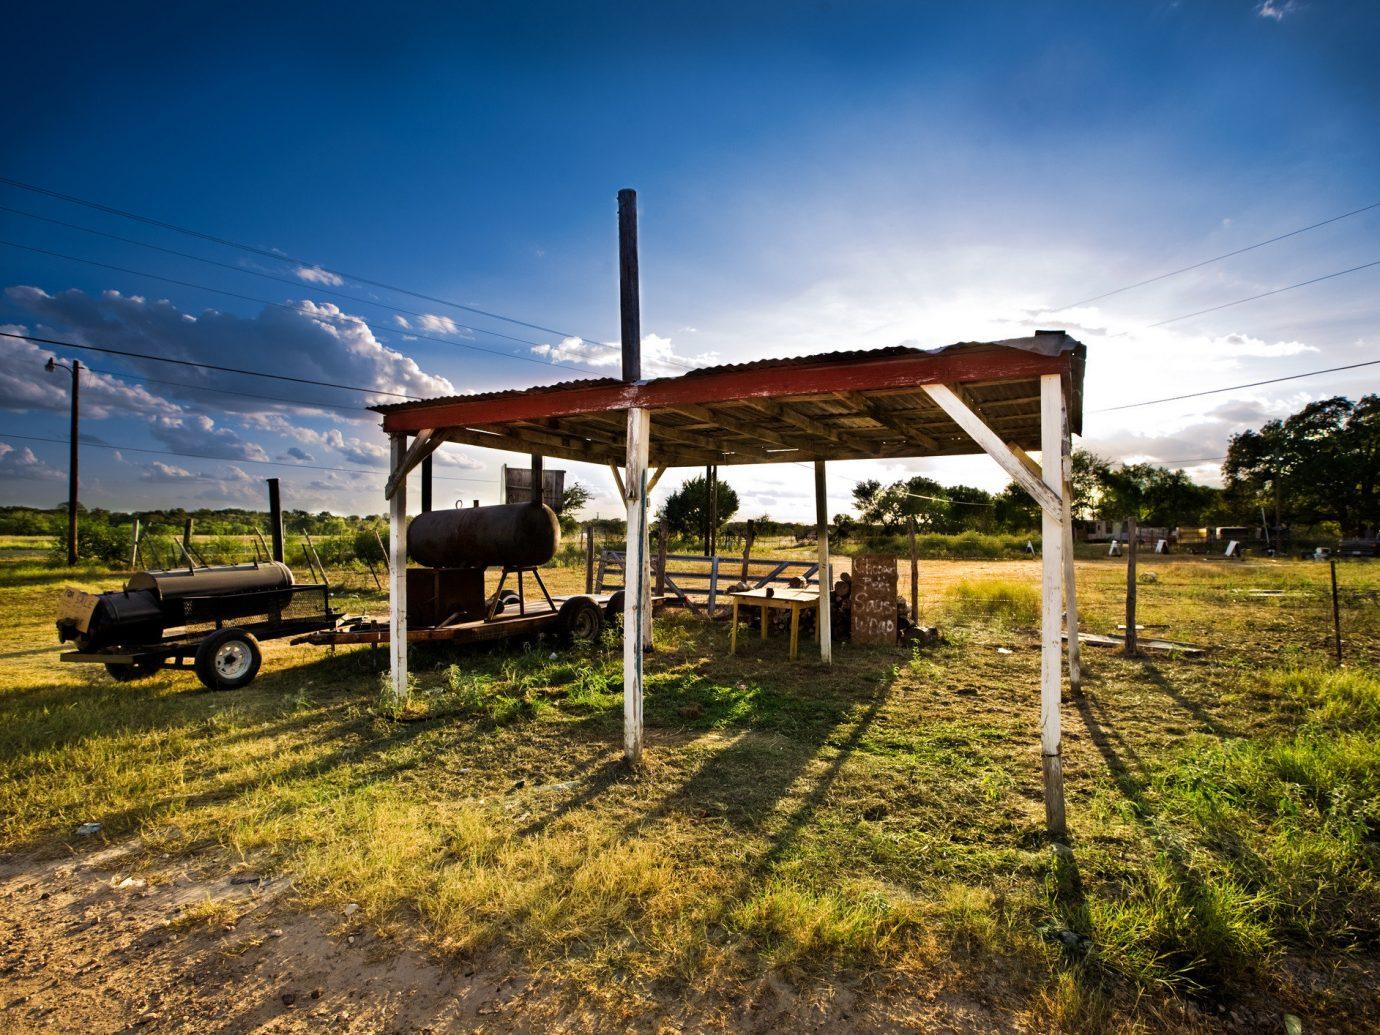 Jetsetter Guides grass sky outdoor transport rural area Farm landscape Ranch agriculture dirt